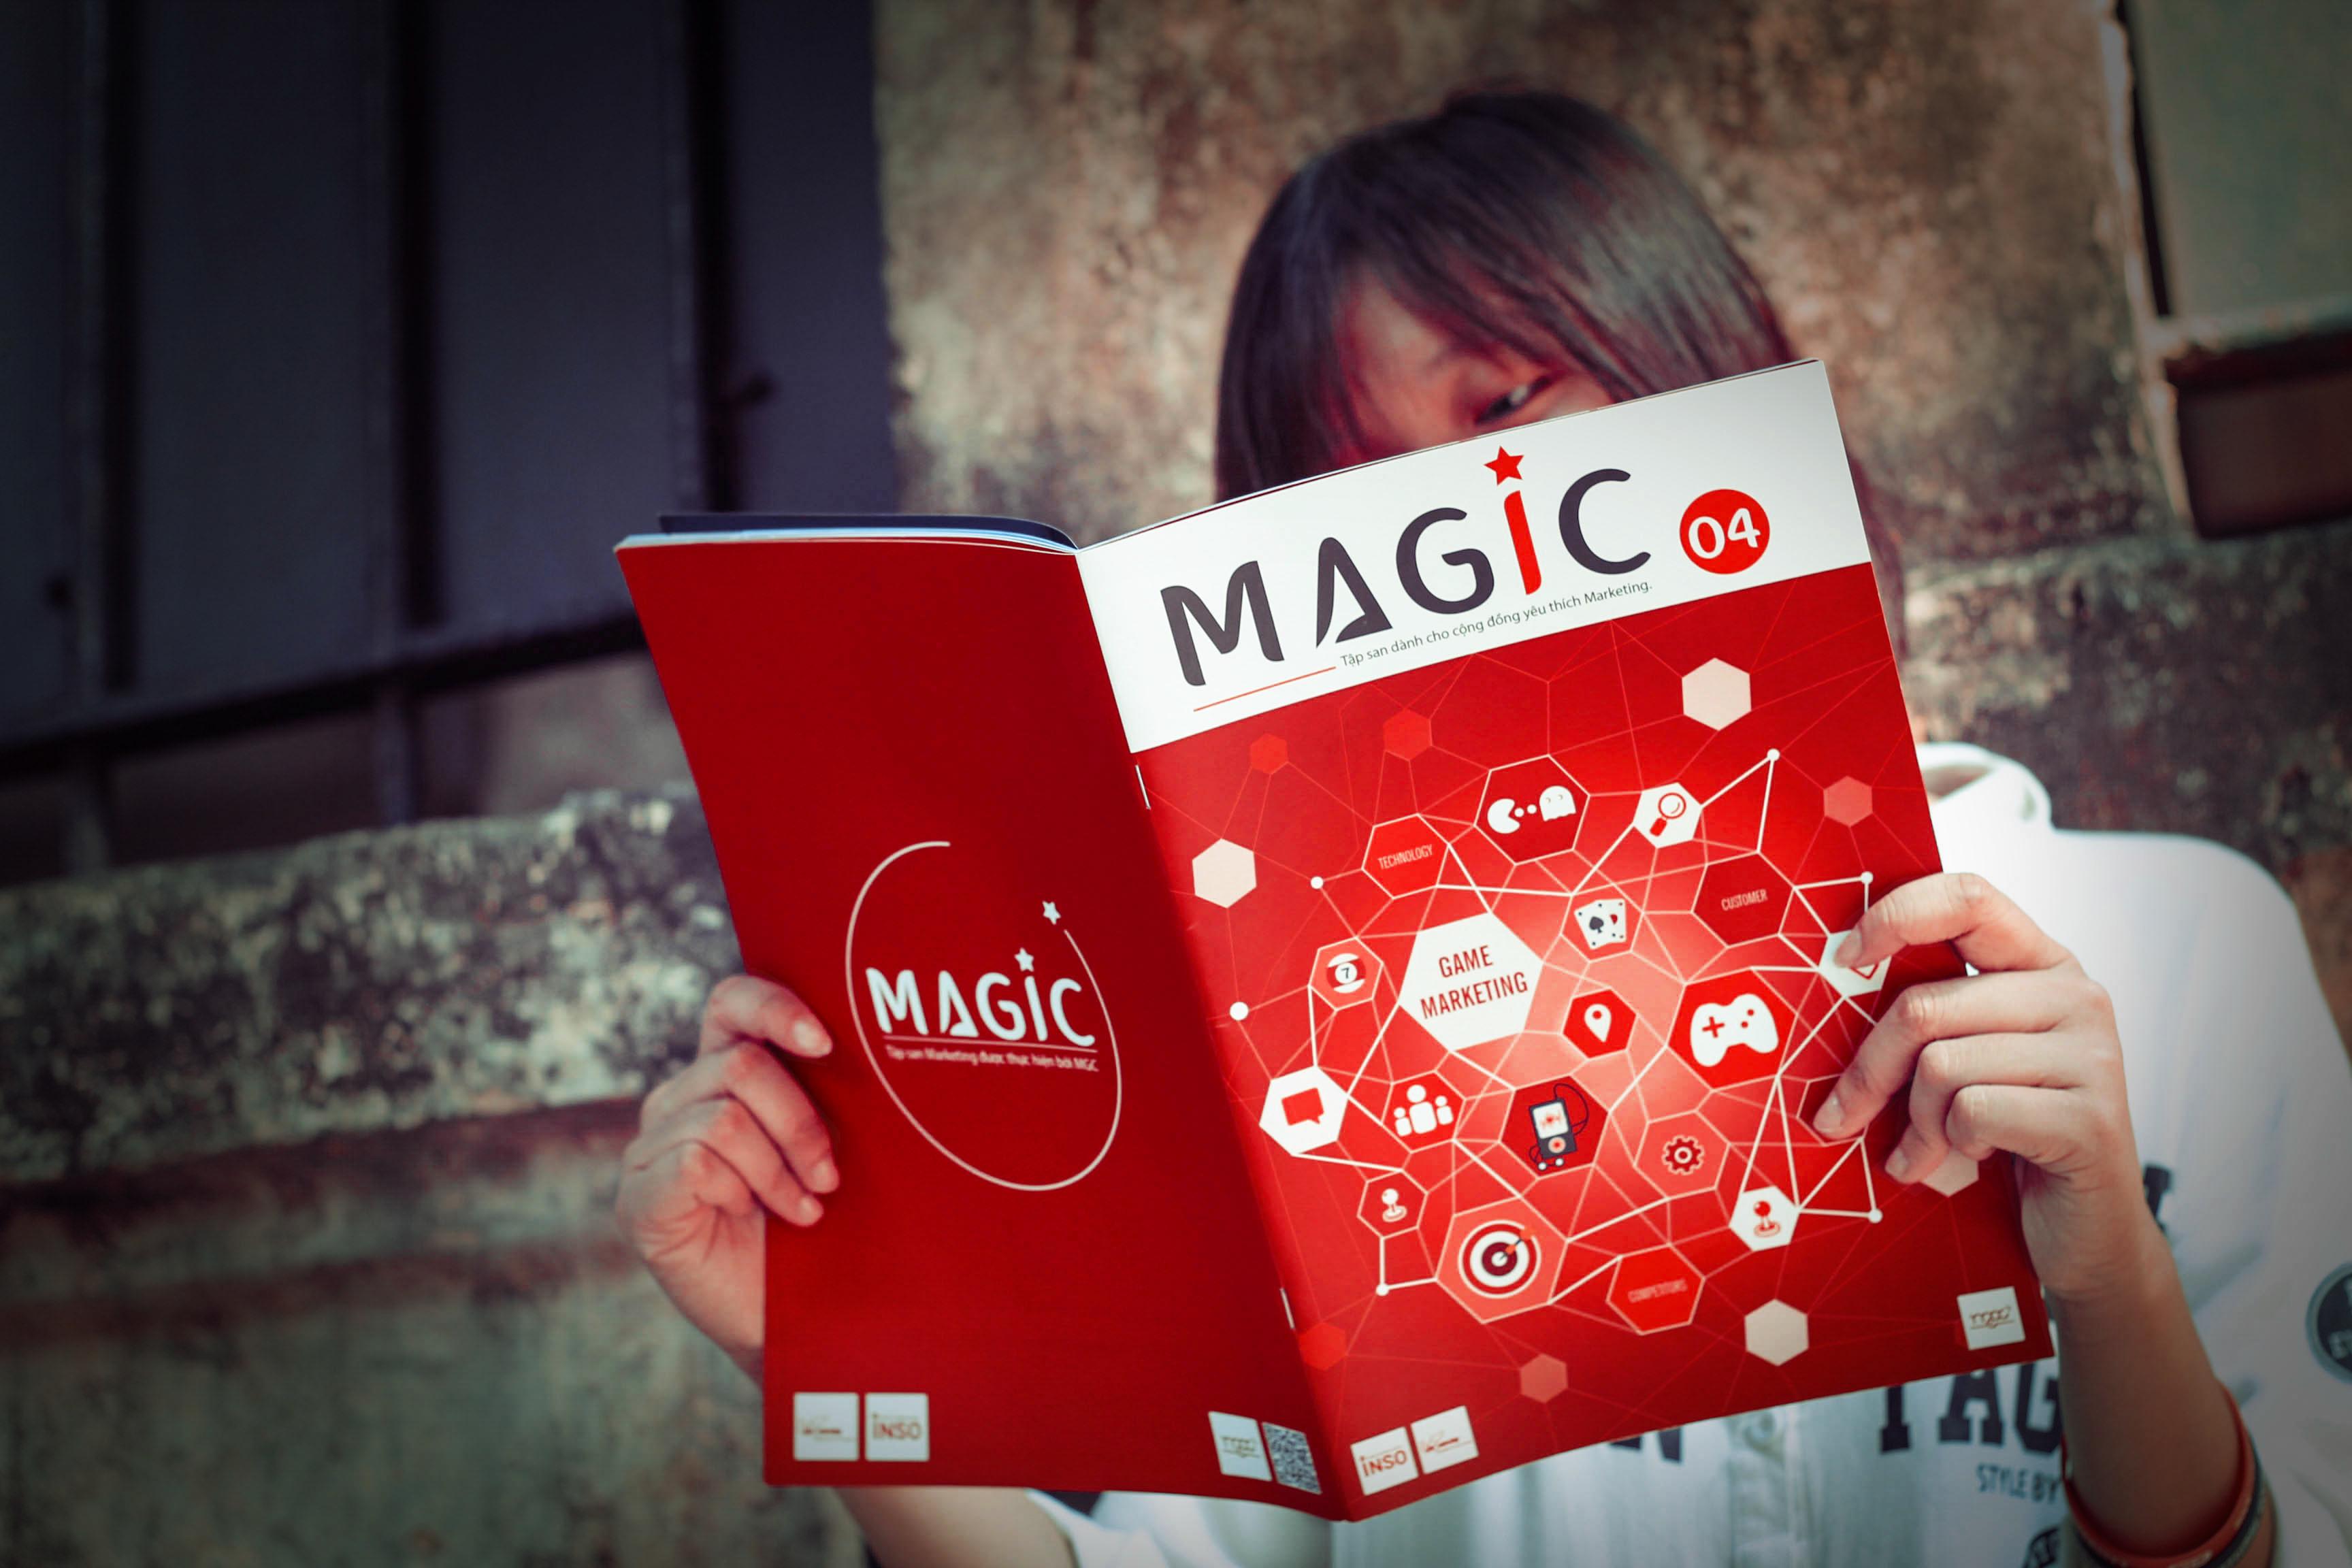 MAGIC - Tập san Marketing của MGC